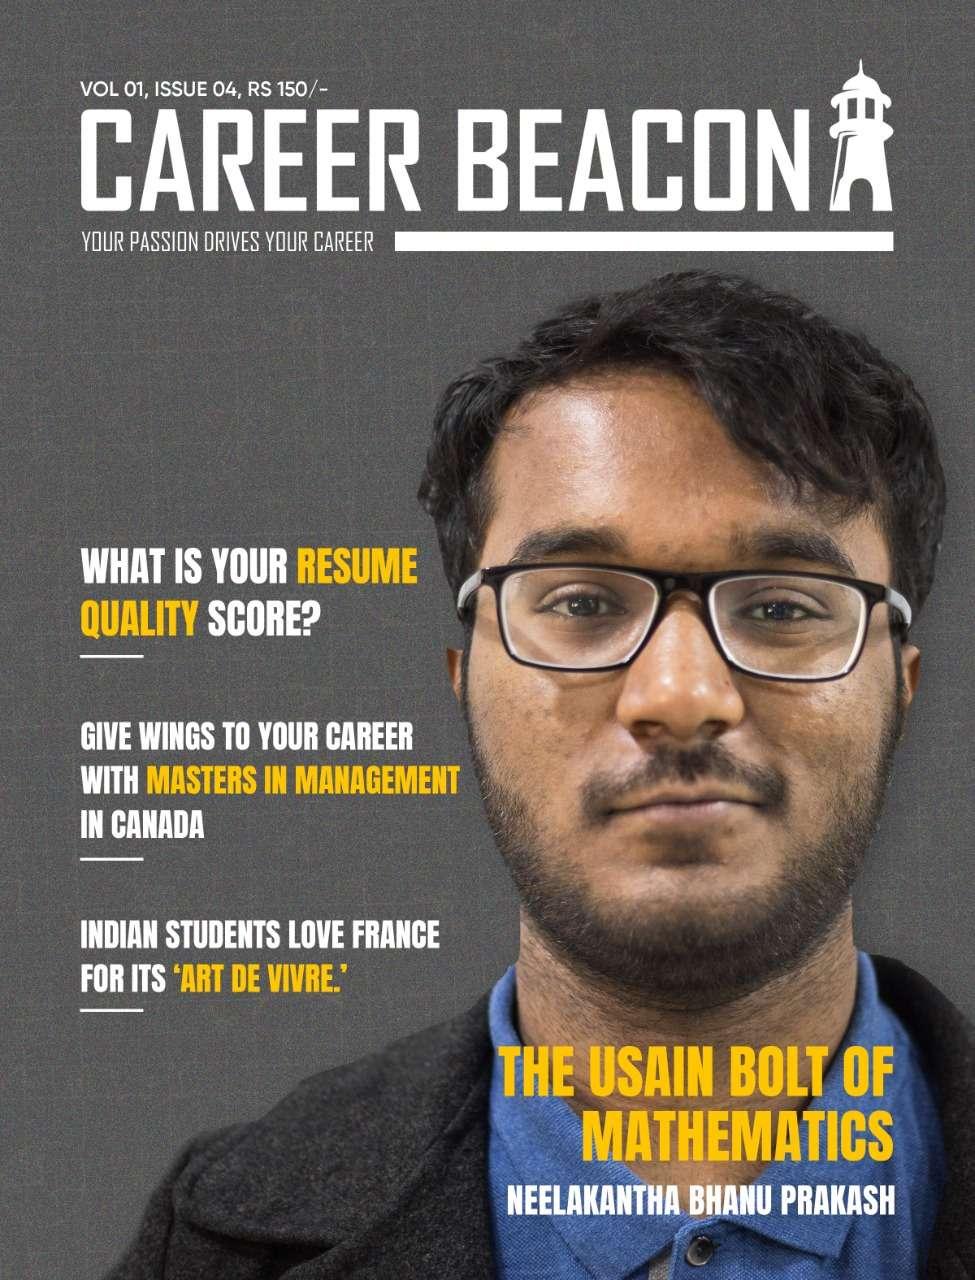 Career Beacon Edition 4